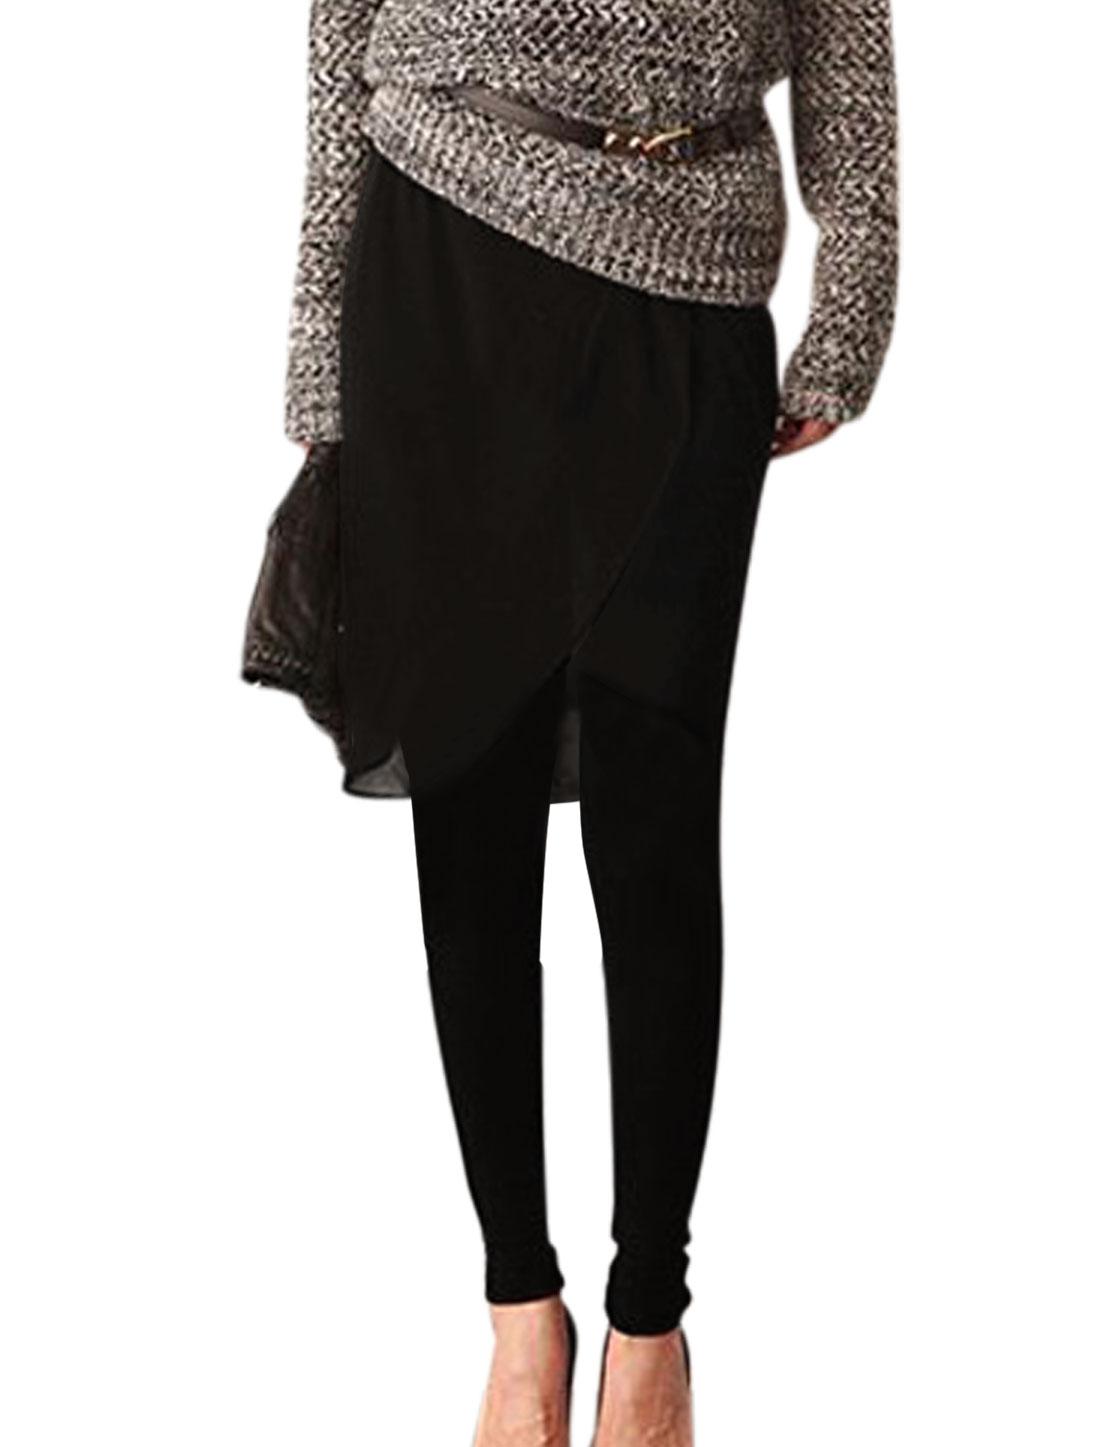 Lady Elastic Waist Split-Chiffon Panel Slim Fit Skirt Leggings Black XS